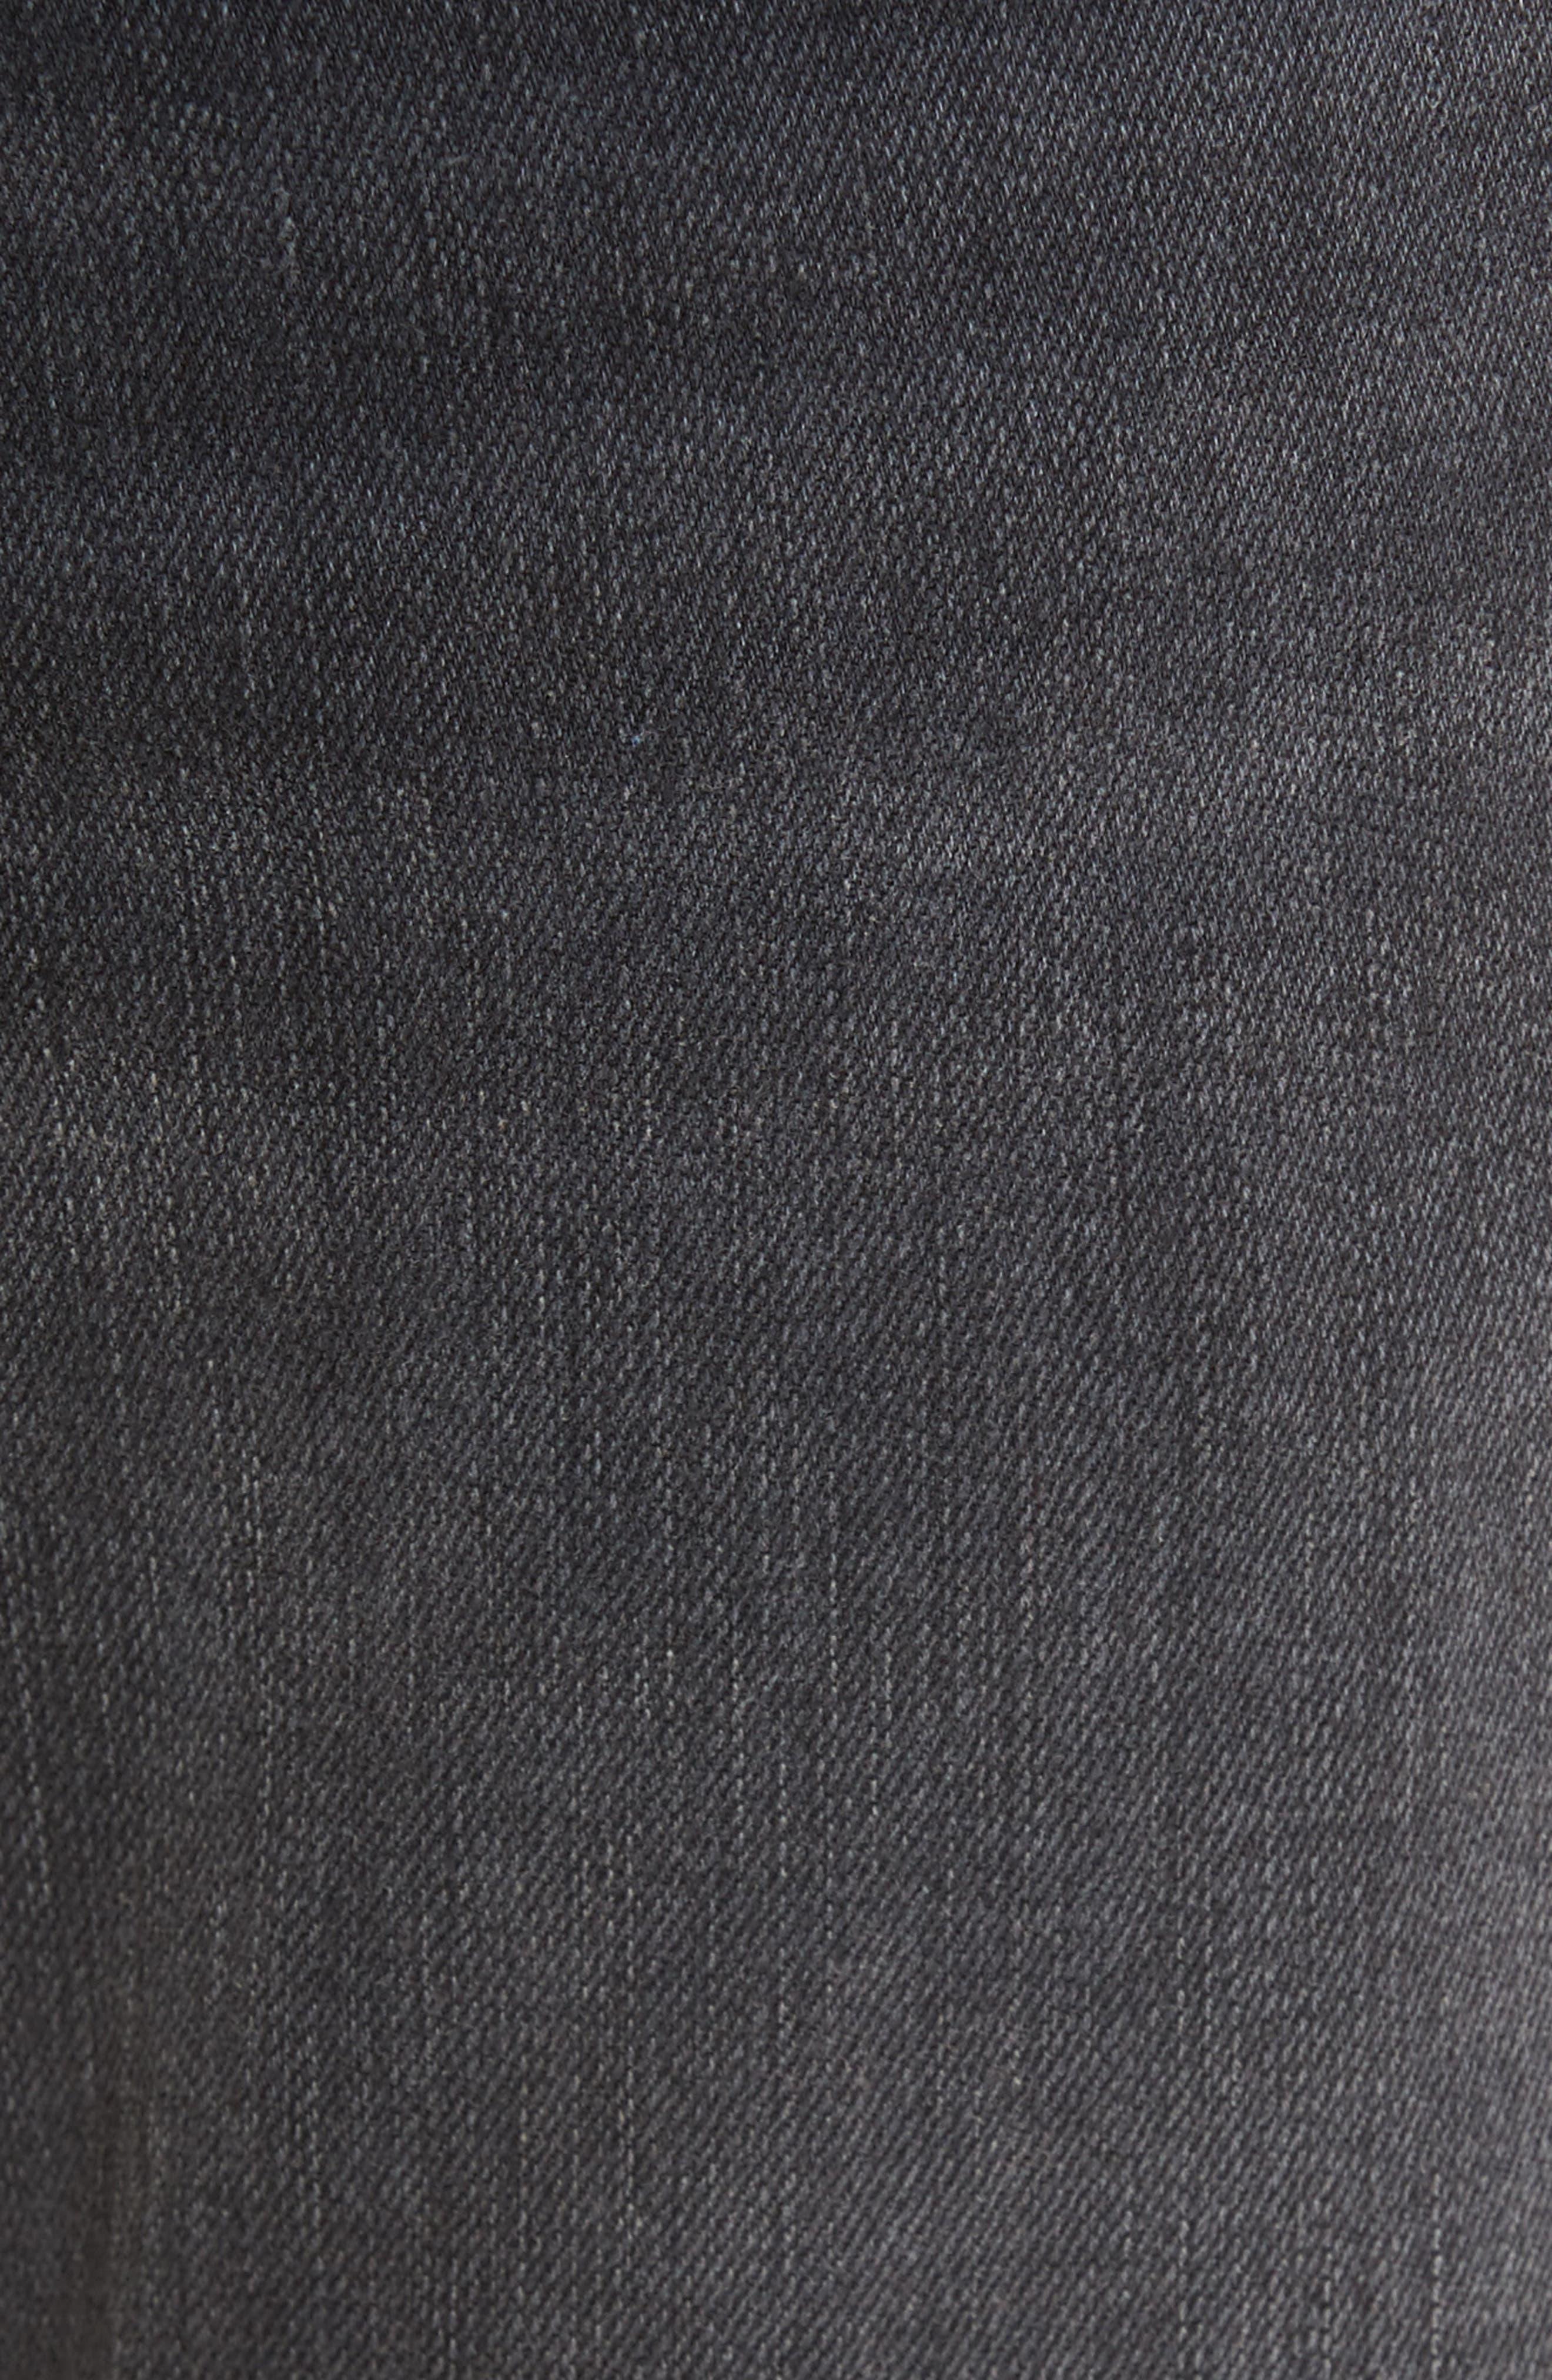 Byron Slim Straight Leg Jeans,                             Alternate thumbnail 5, color,